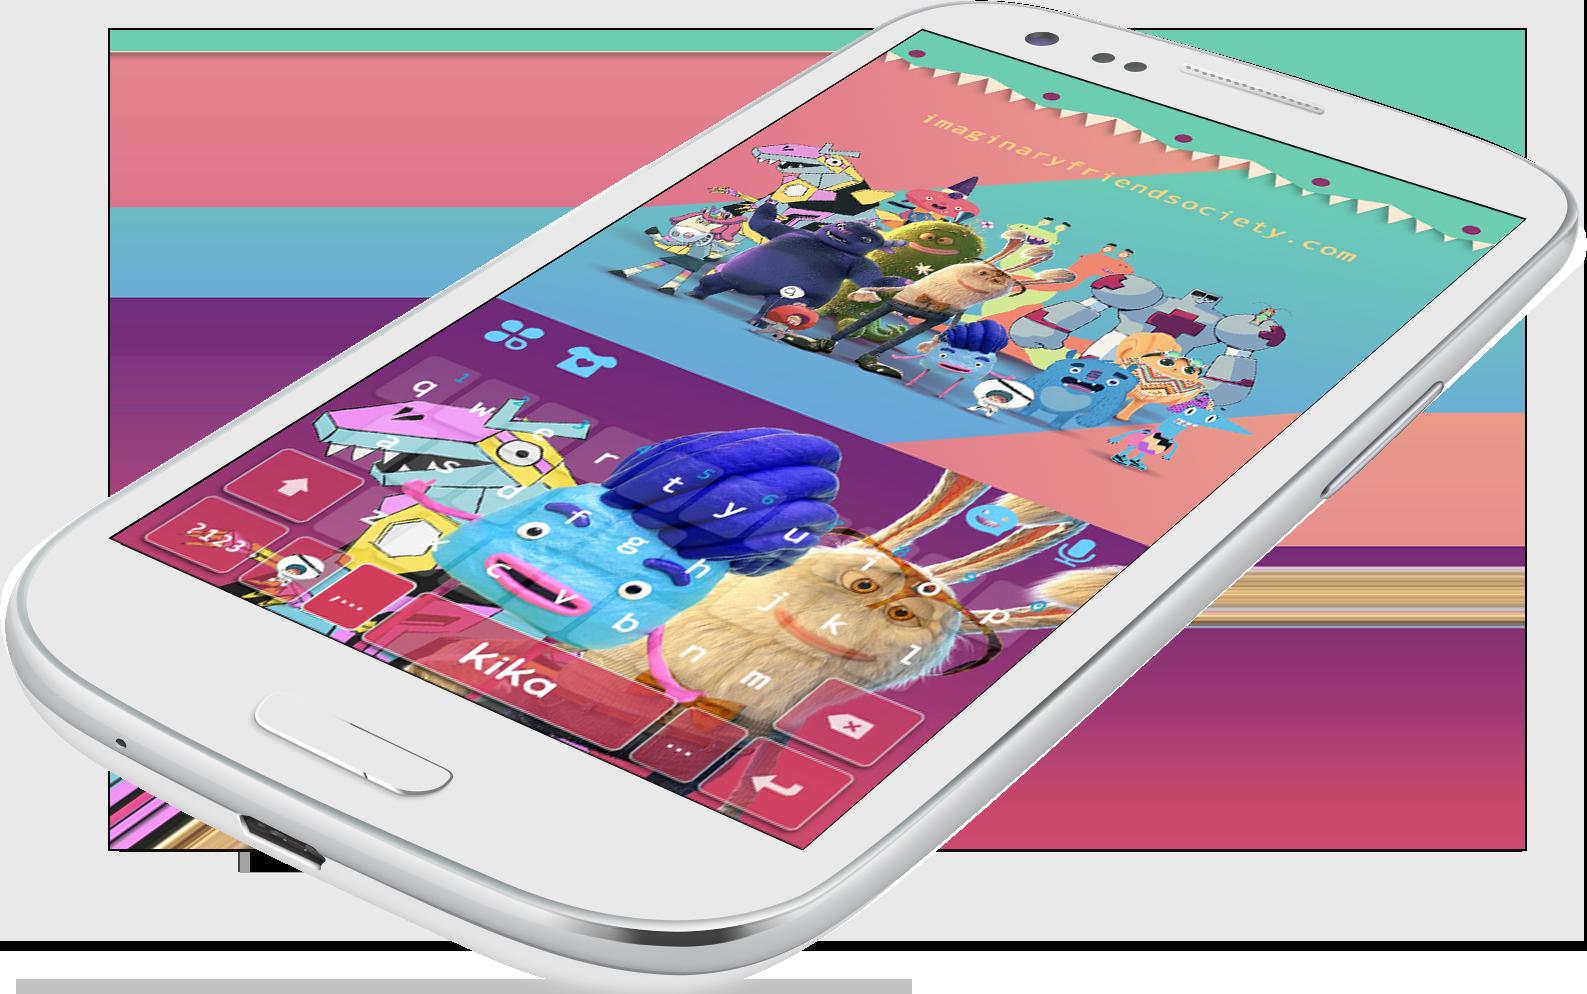 Top emoji keyboard apps for android | Top 20 Best Emoji Apps